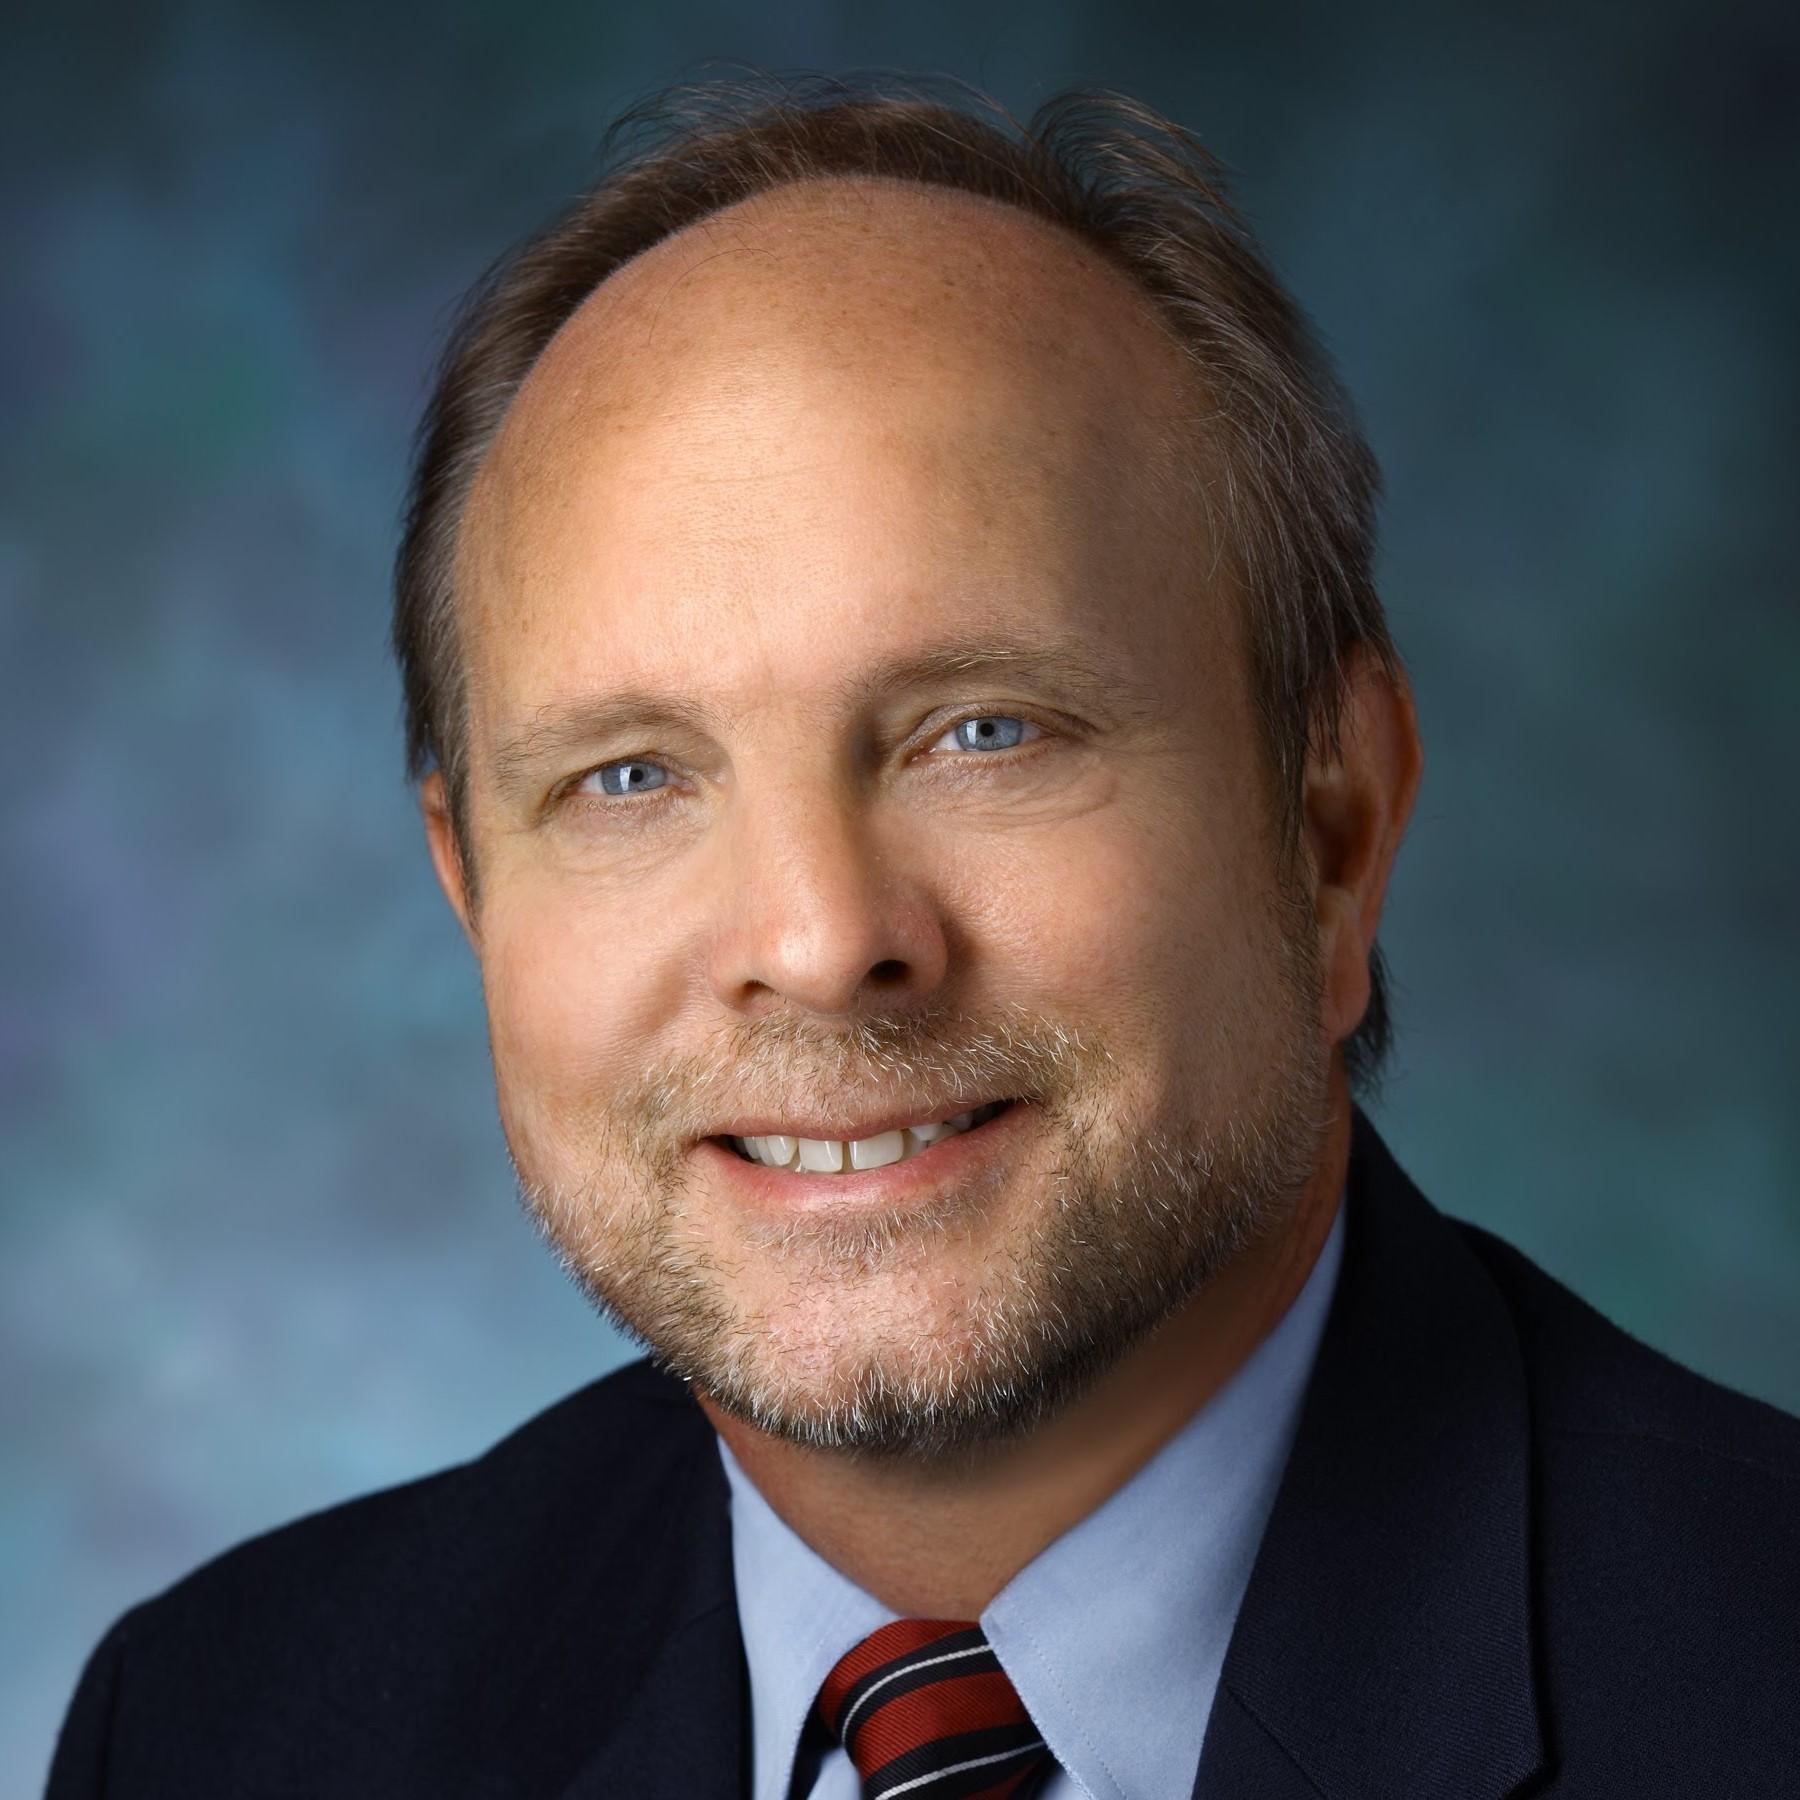 David M. Euhus